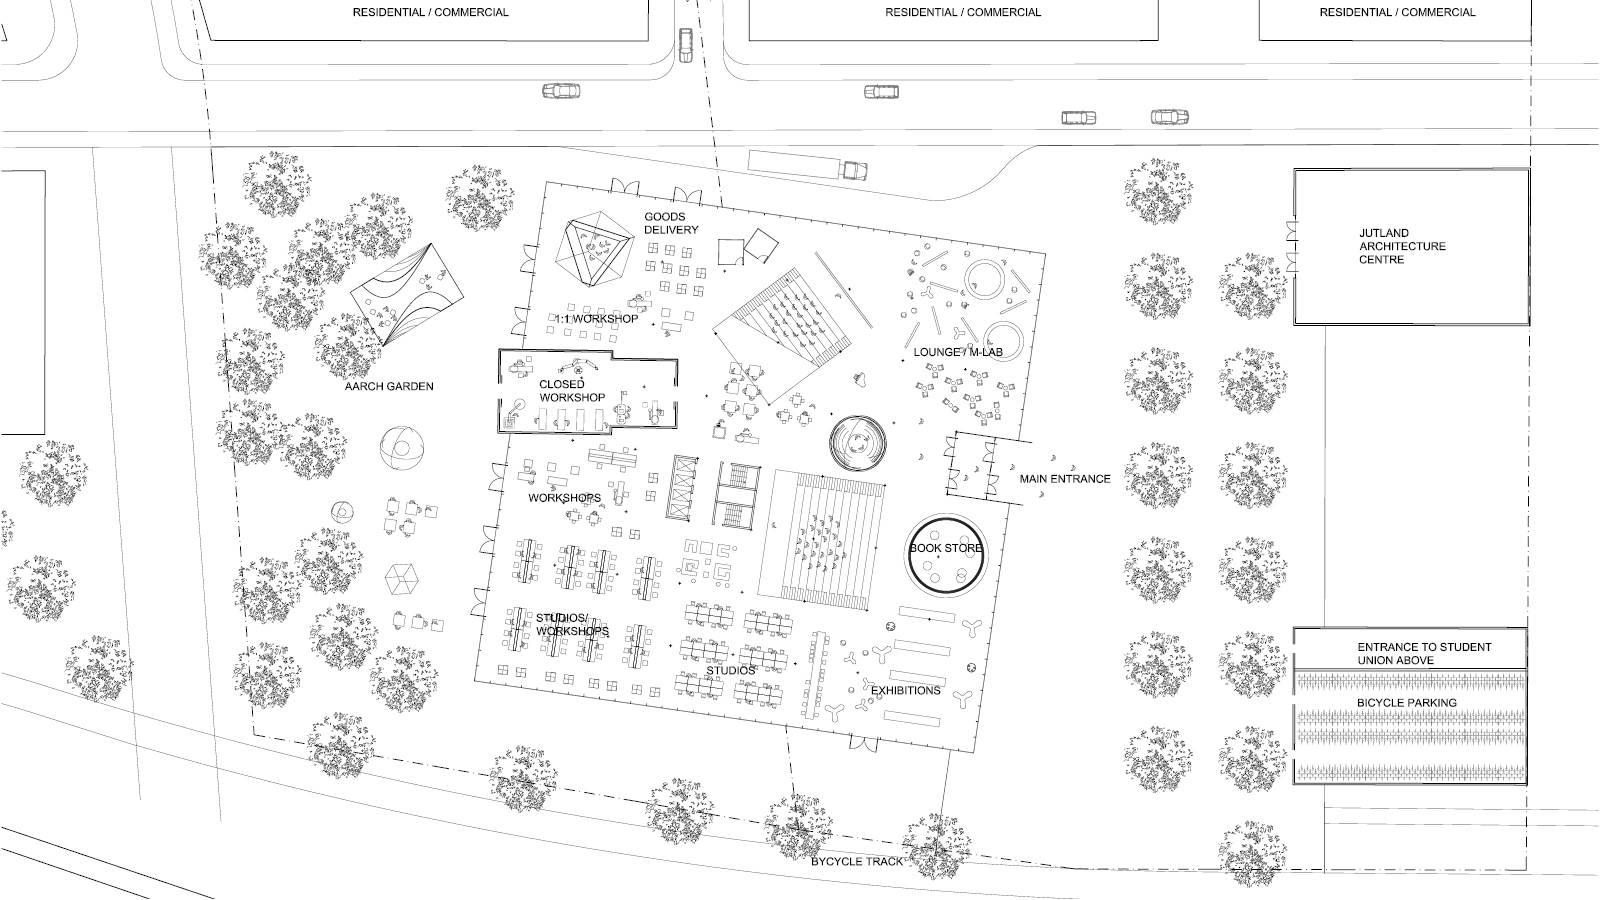 GROUND FLOOR PLAN - NEW AARCH – CREATIVE CLOUD - SPOL Architects